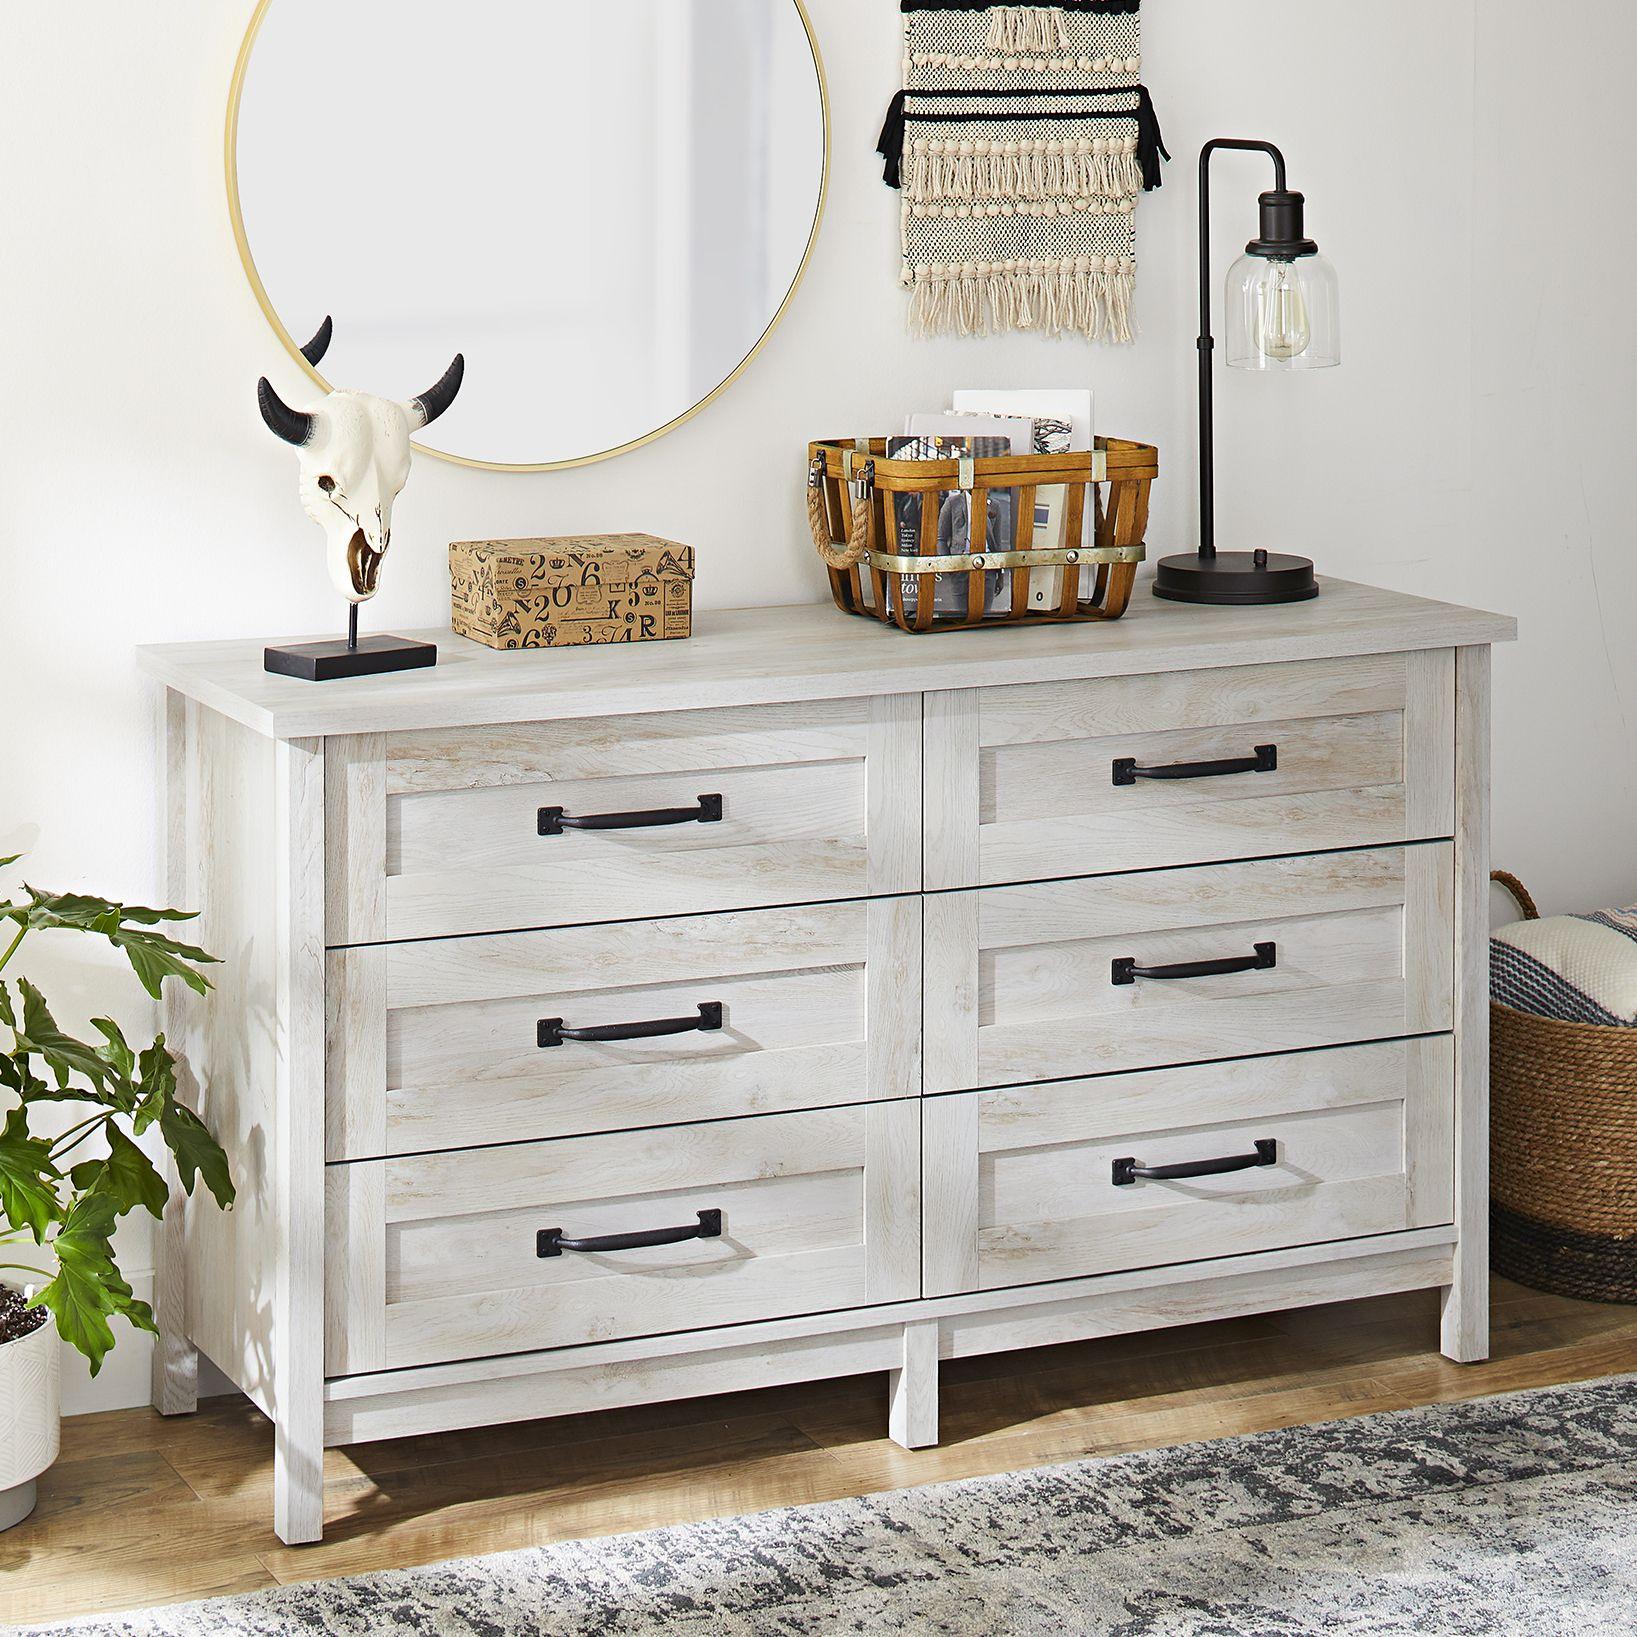 Better Homes & Gardens Modern Farmhouse 9-Drawer Dresser, Rustic